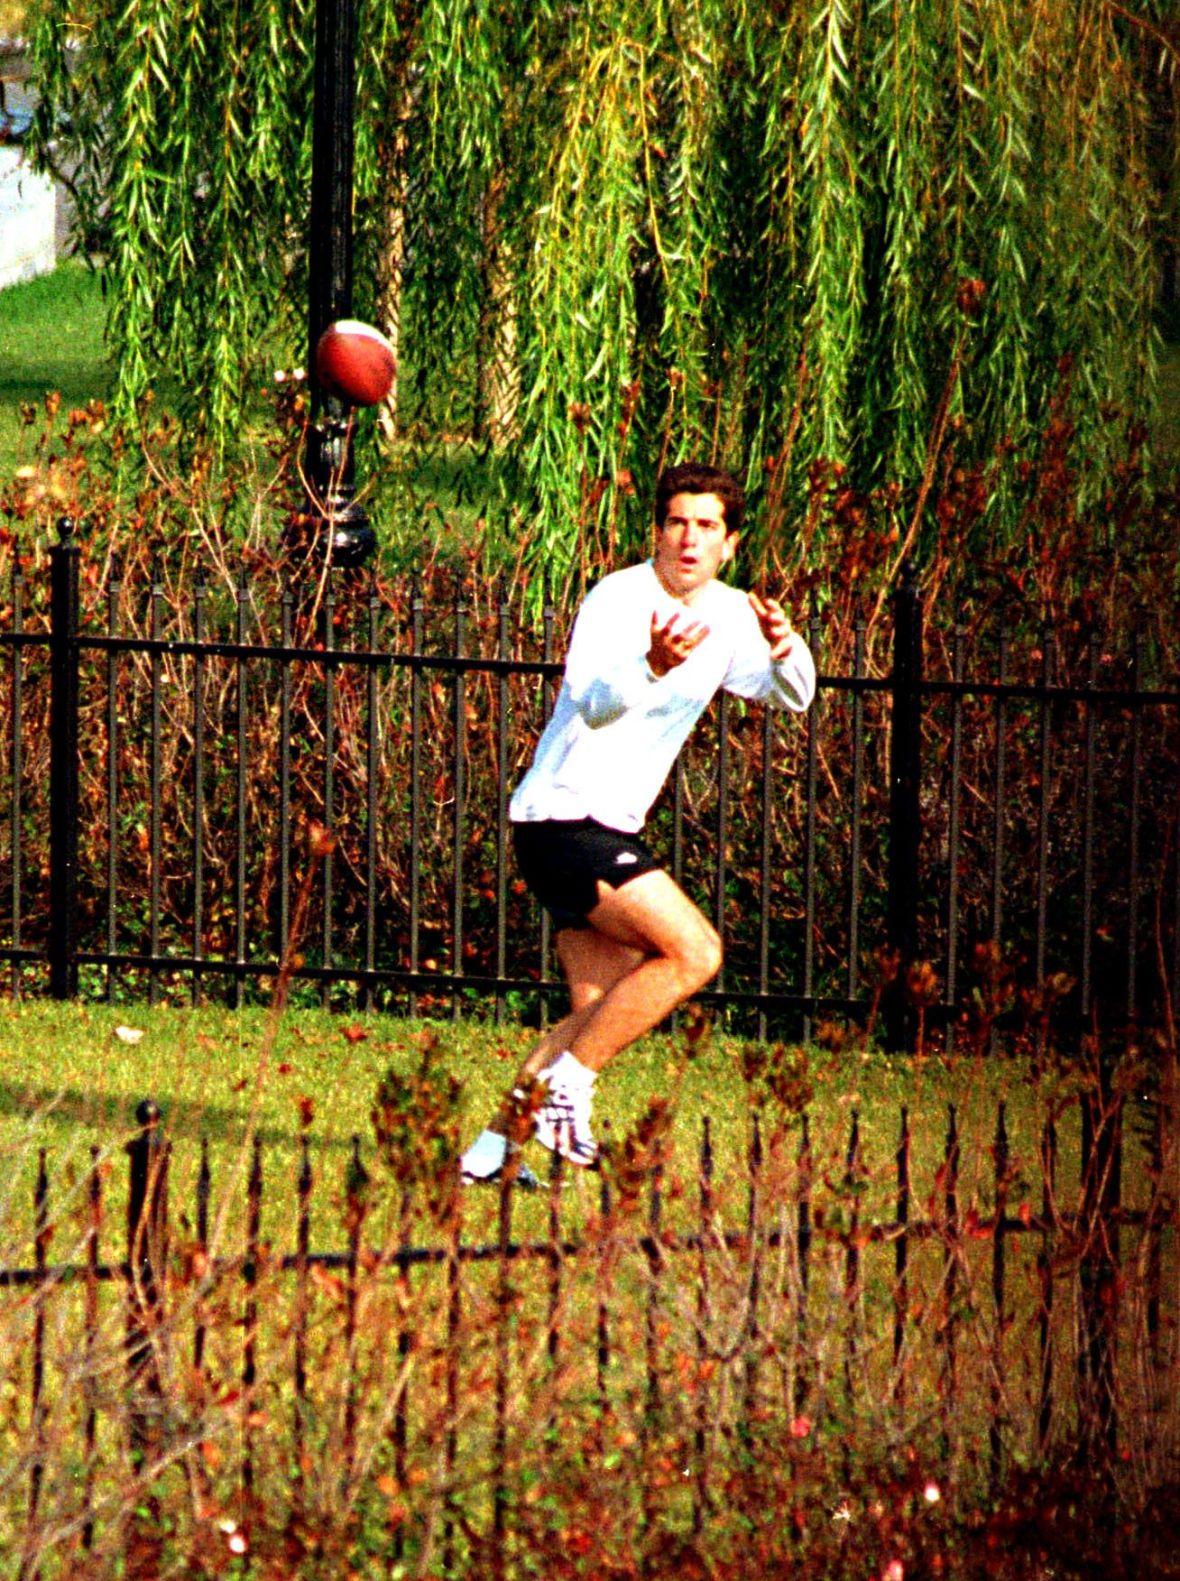 John F. Kennedy Jr. Playing Football